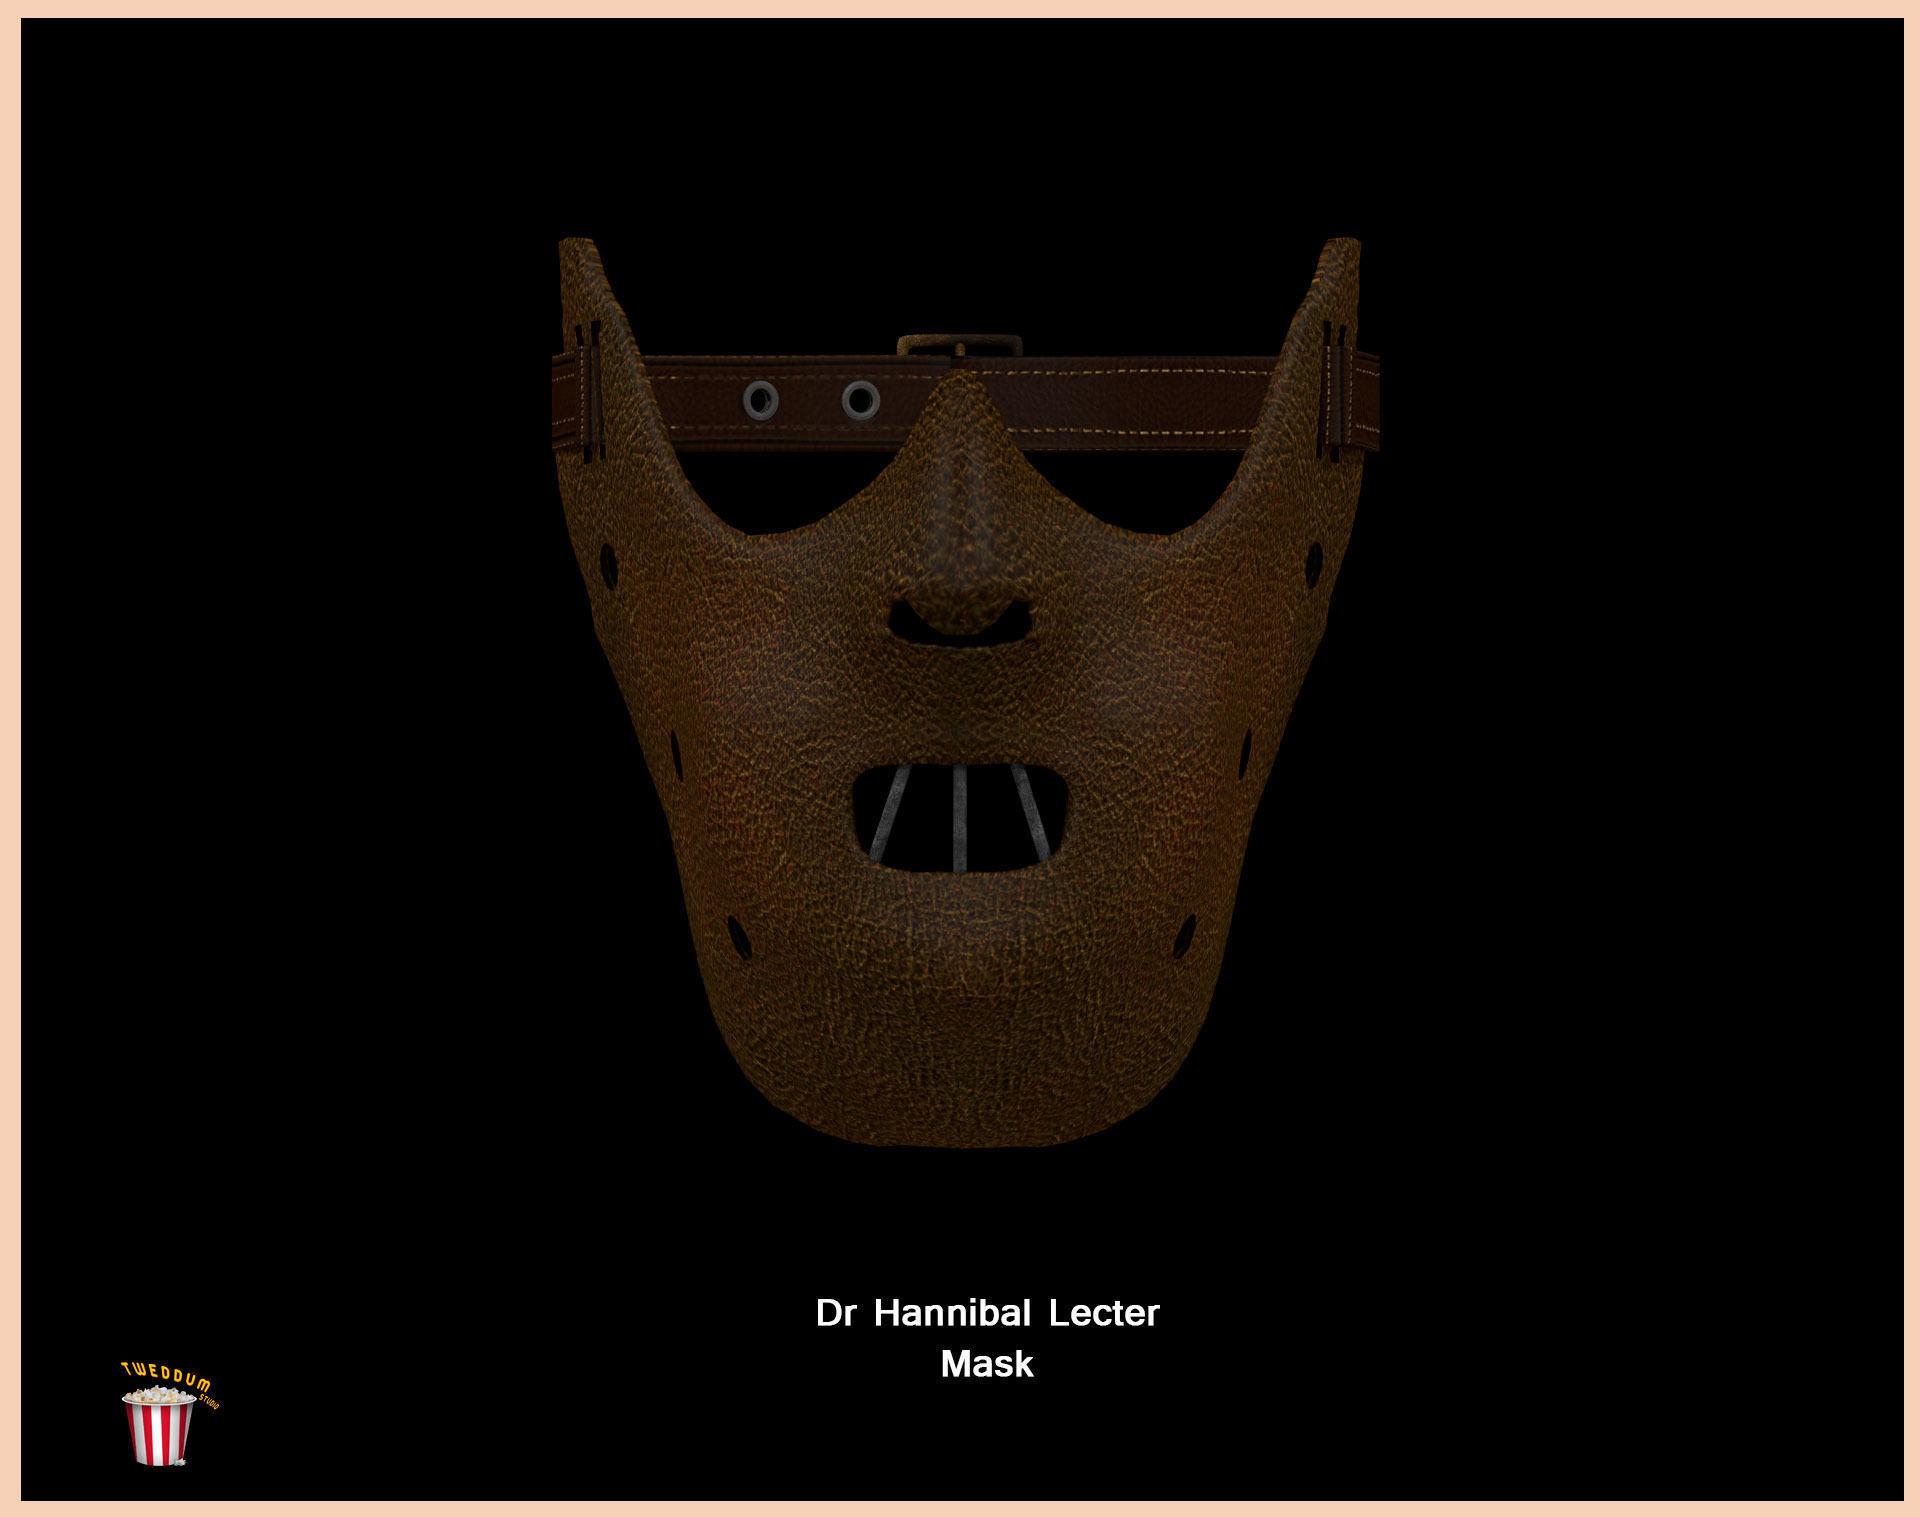 Dr Hannibal Lecter Mask - Anthony Hopkins - High Quality